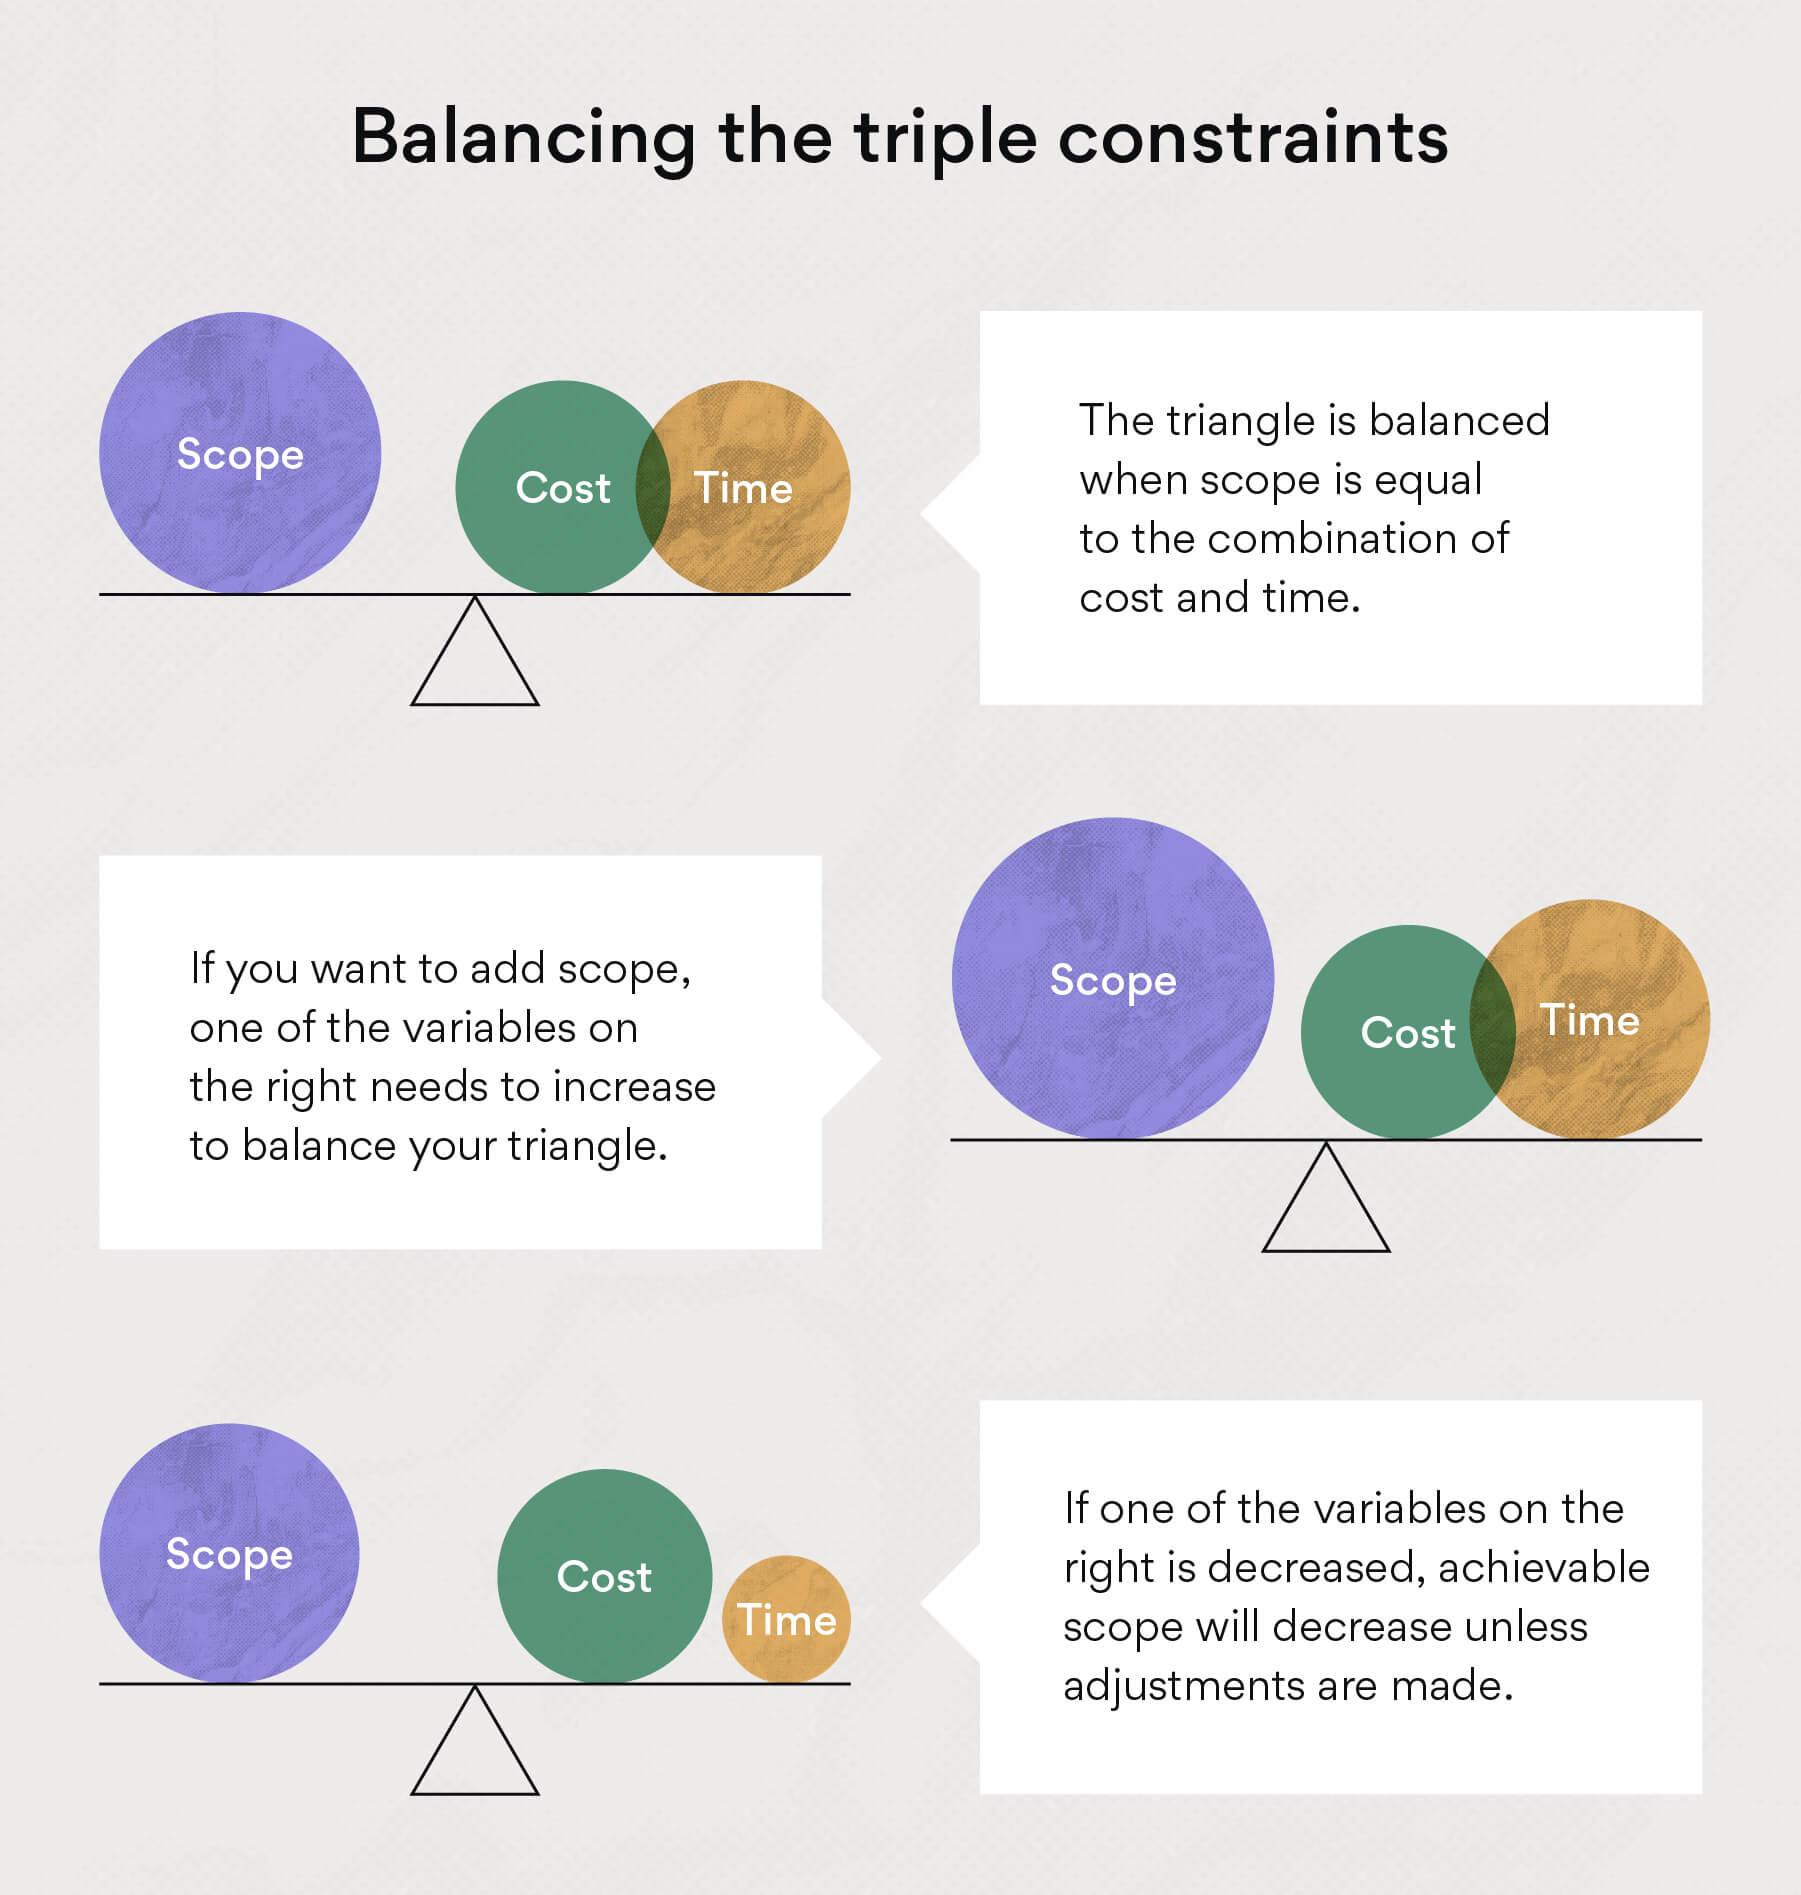 Balancing the triple constraints